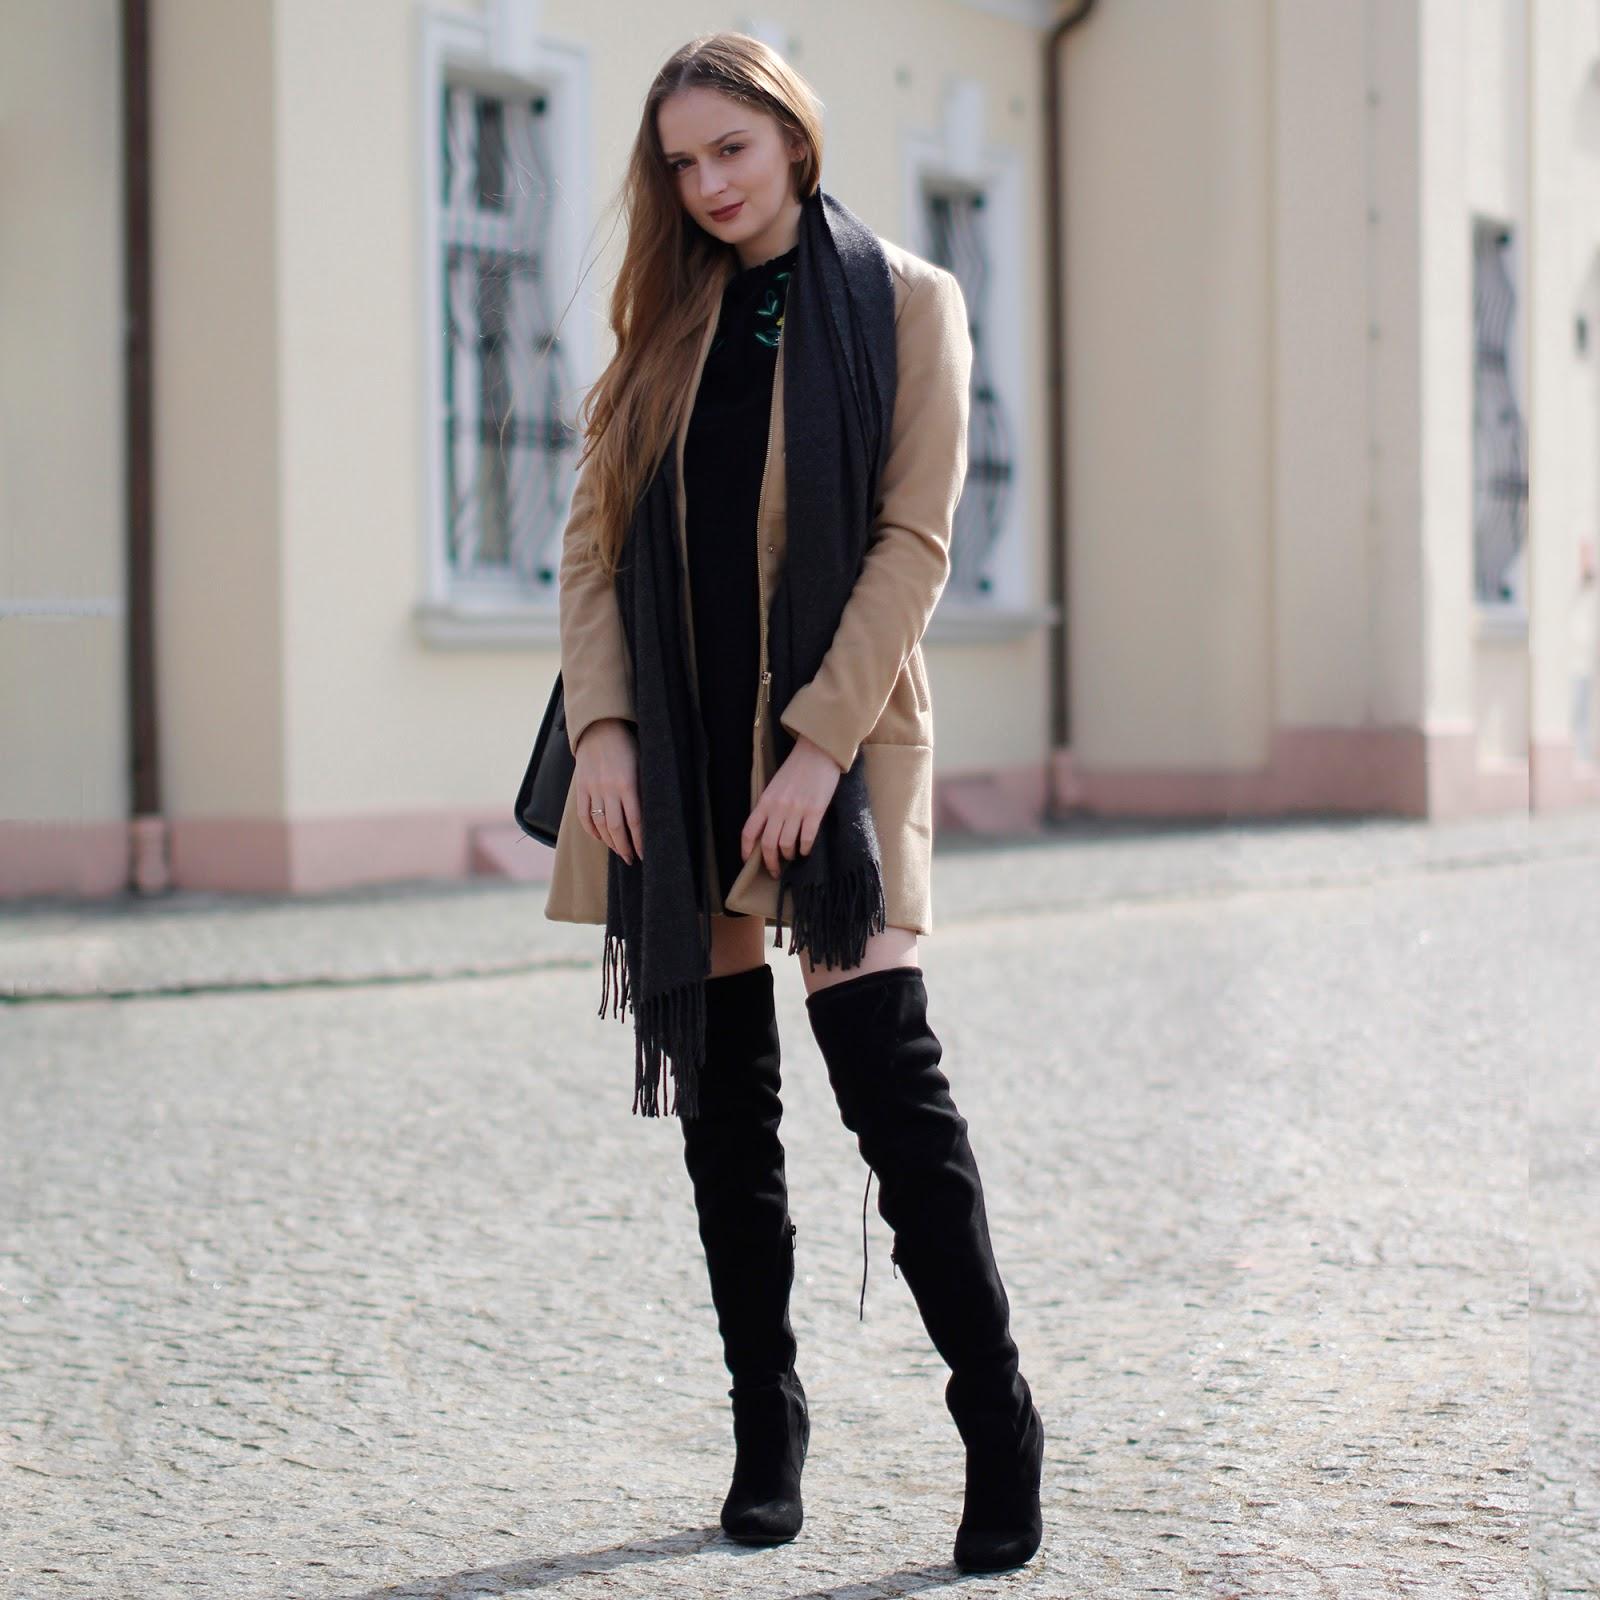 BLACK FLORAL DRESS #OUTFIT